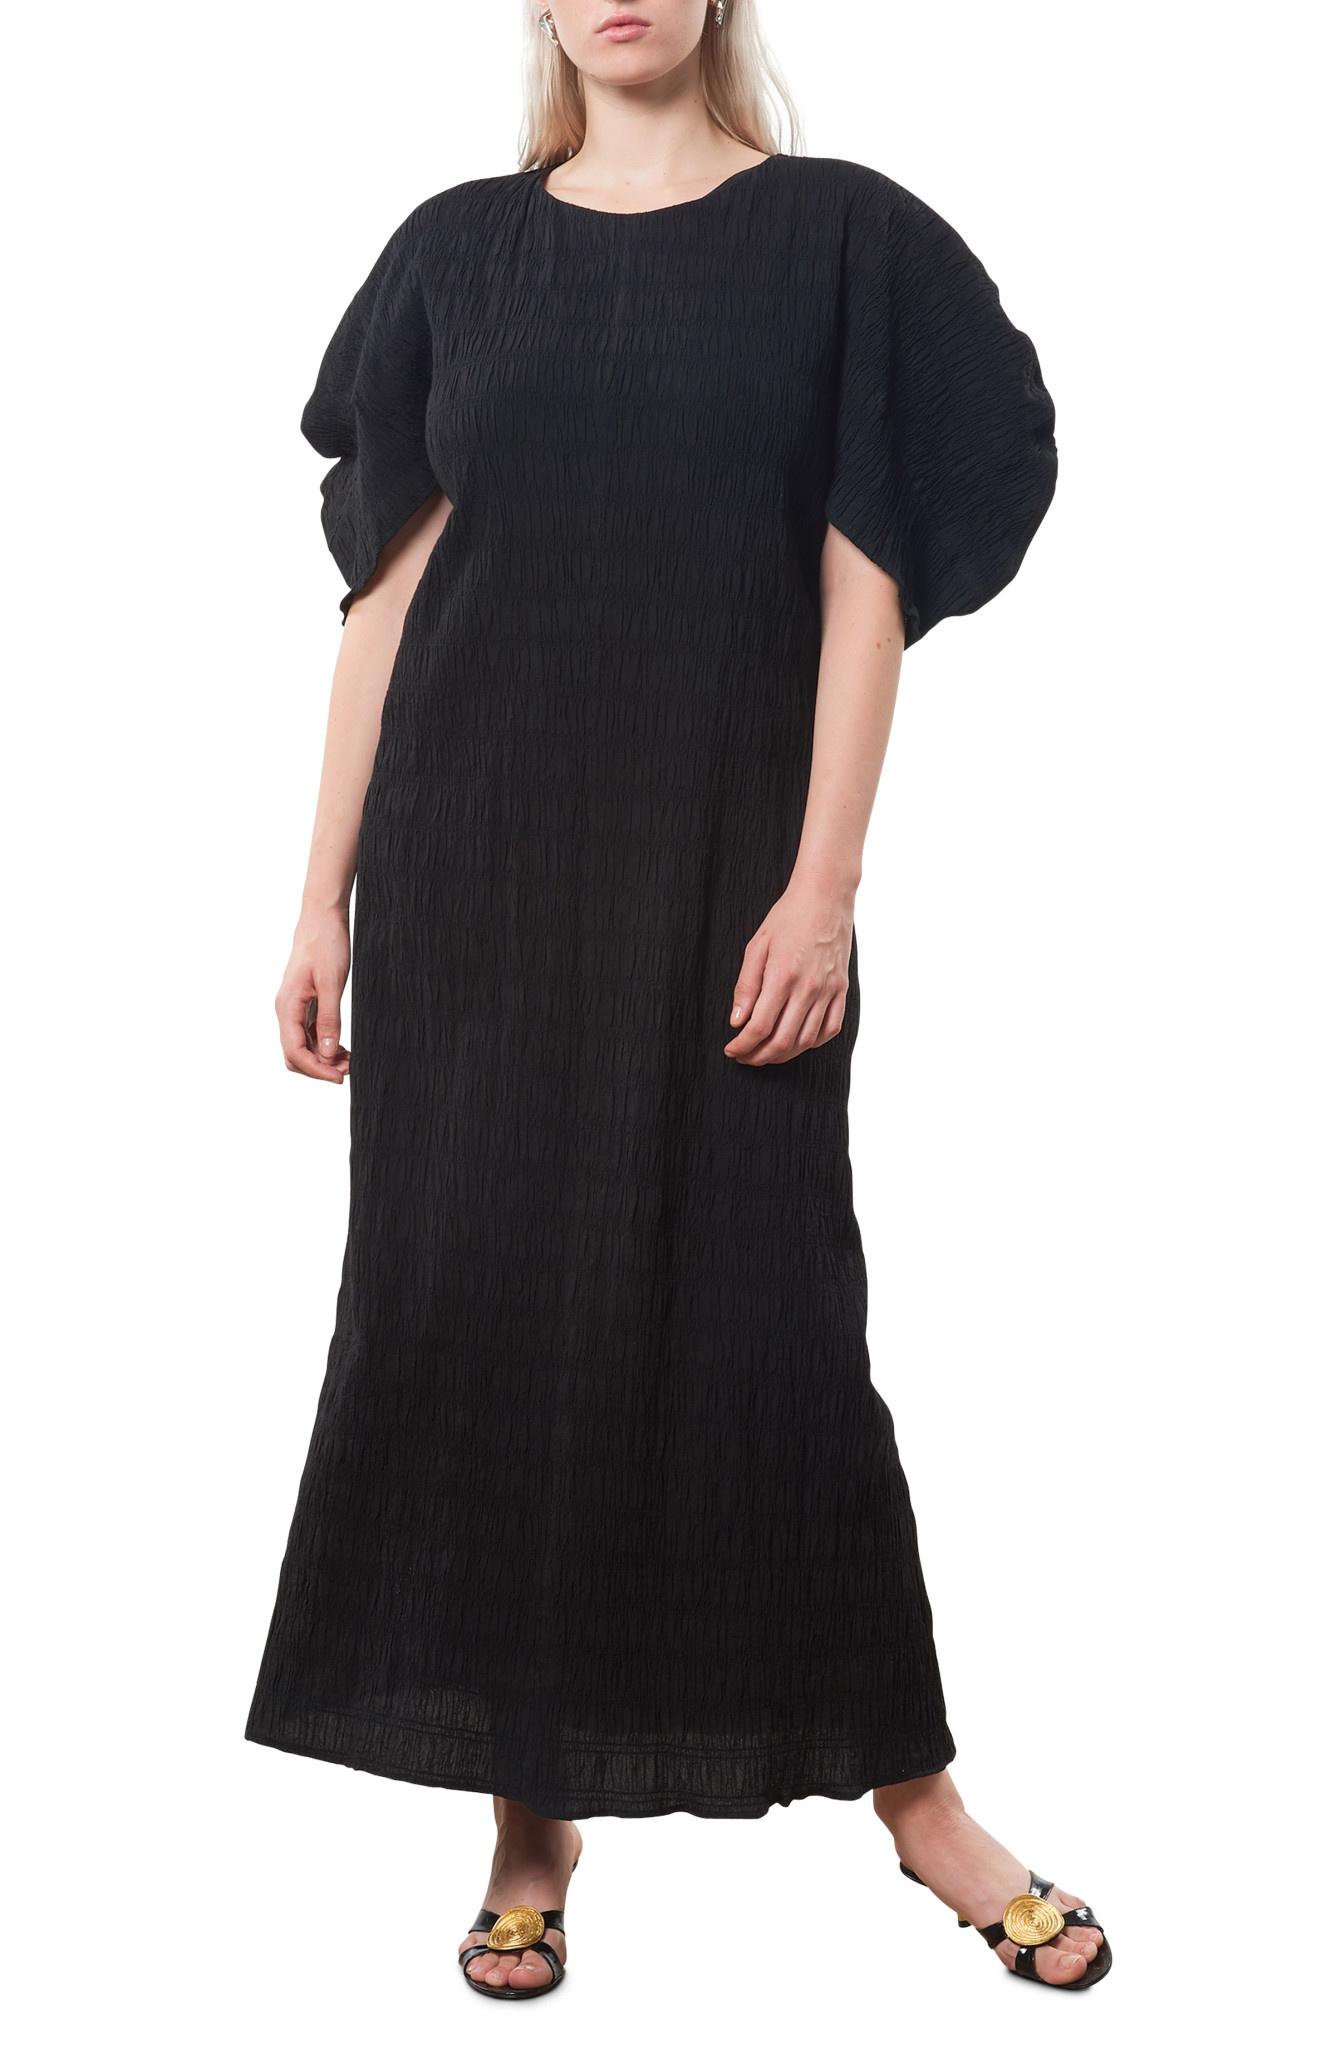 Mara Hoffman Mara Hoffman Aranza Dress in Black